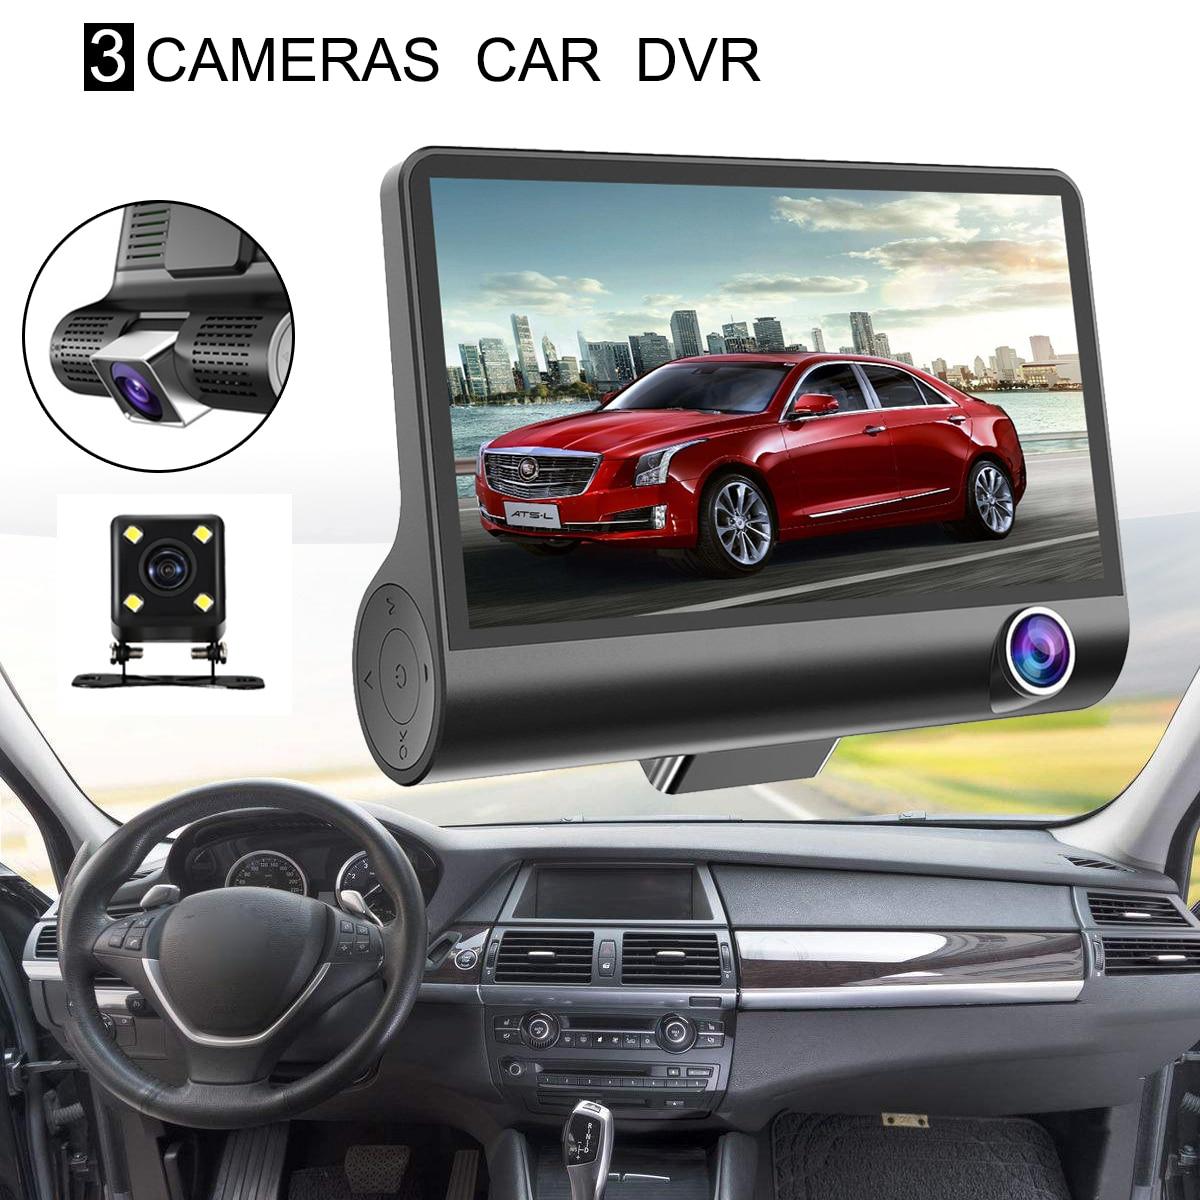 New Original Car DVR Camera Dashcam Full HD 1080P Three Lens 4 Inch Video Registrator Recorder G-sensor Night Vision Dash Cam